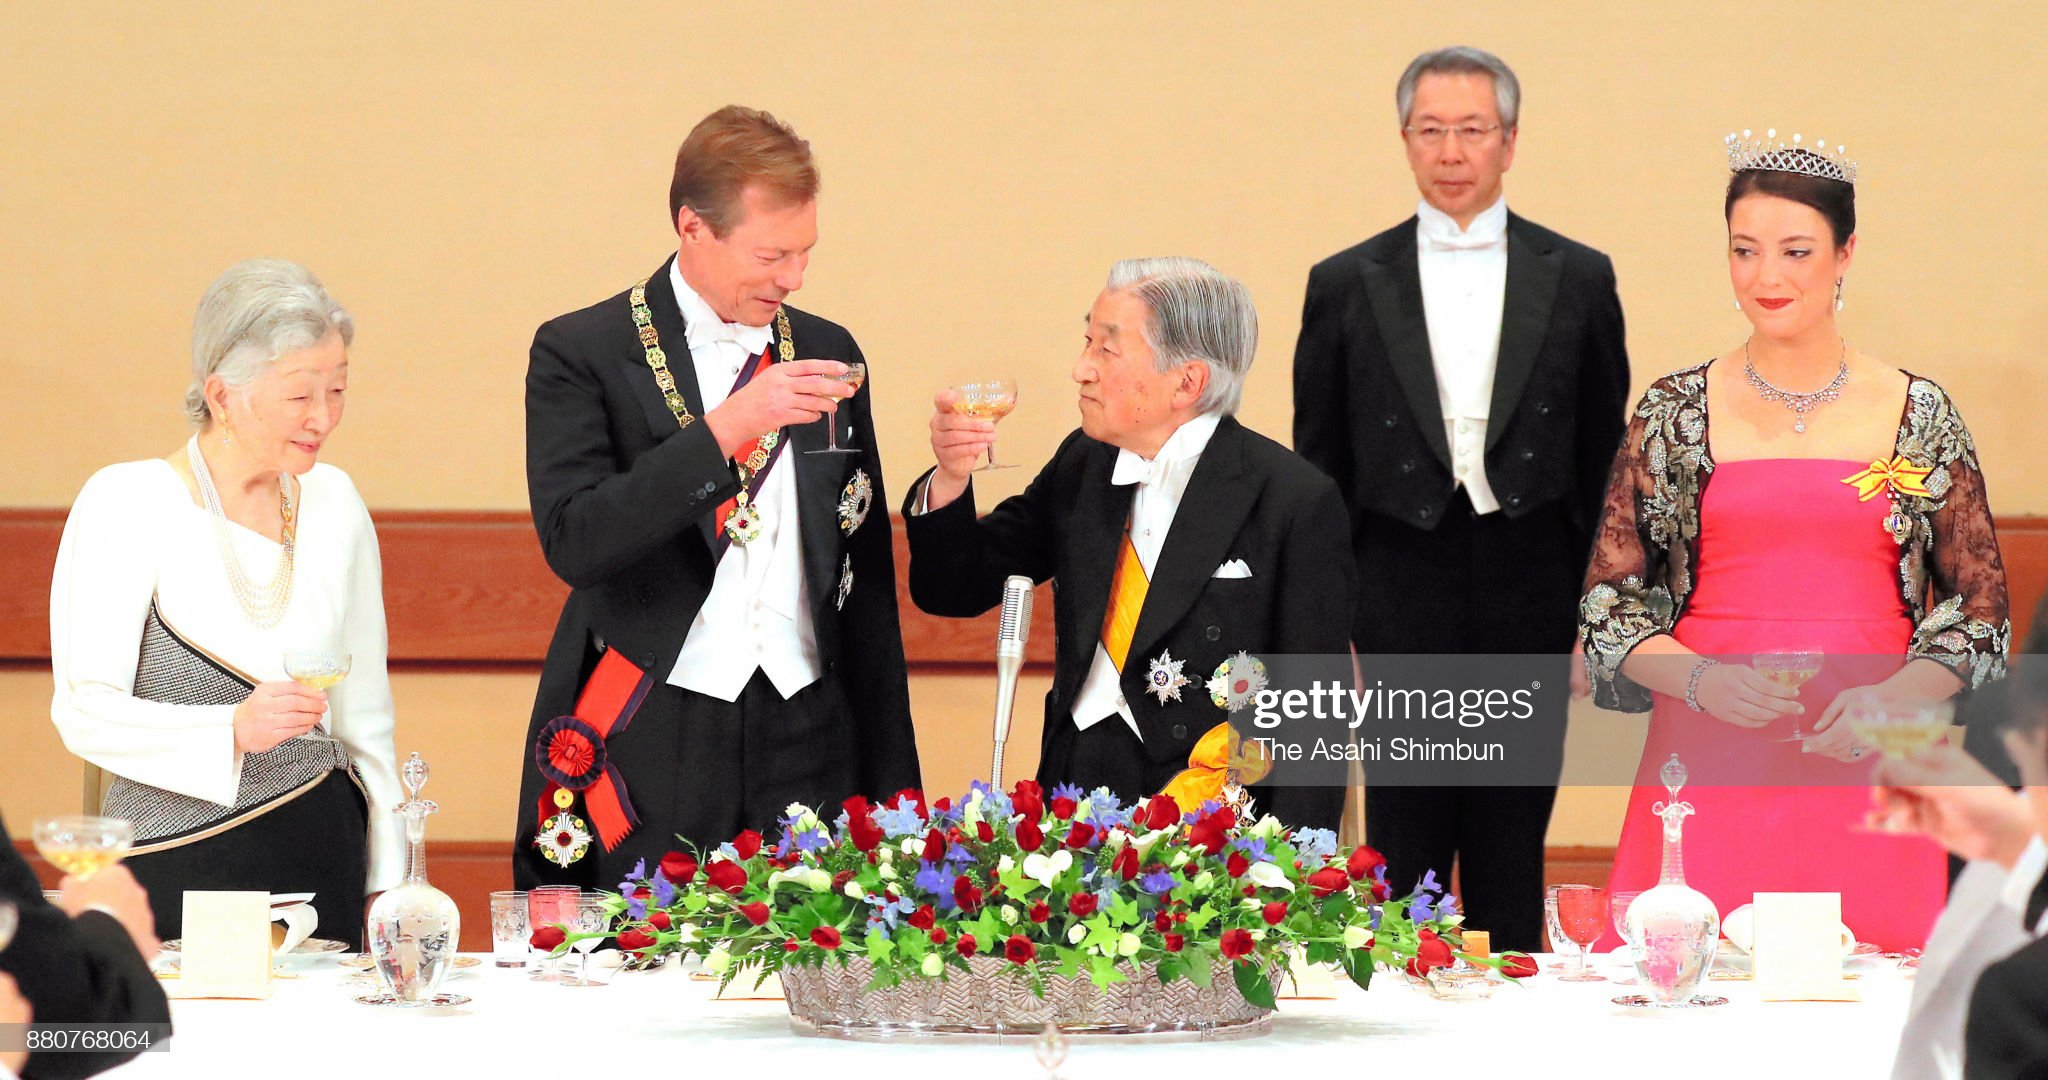 Grand Duke Henri Of Luxembourg Visits Japan - Day 1 : News Photo